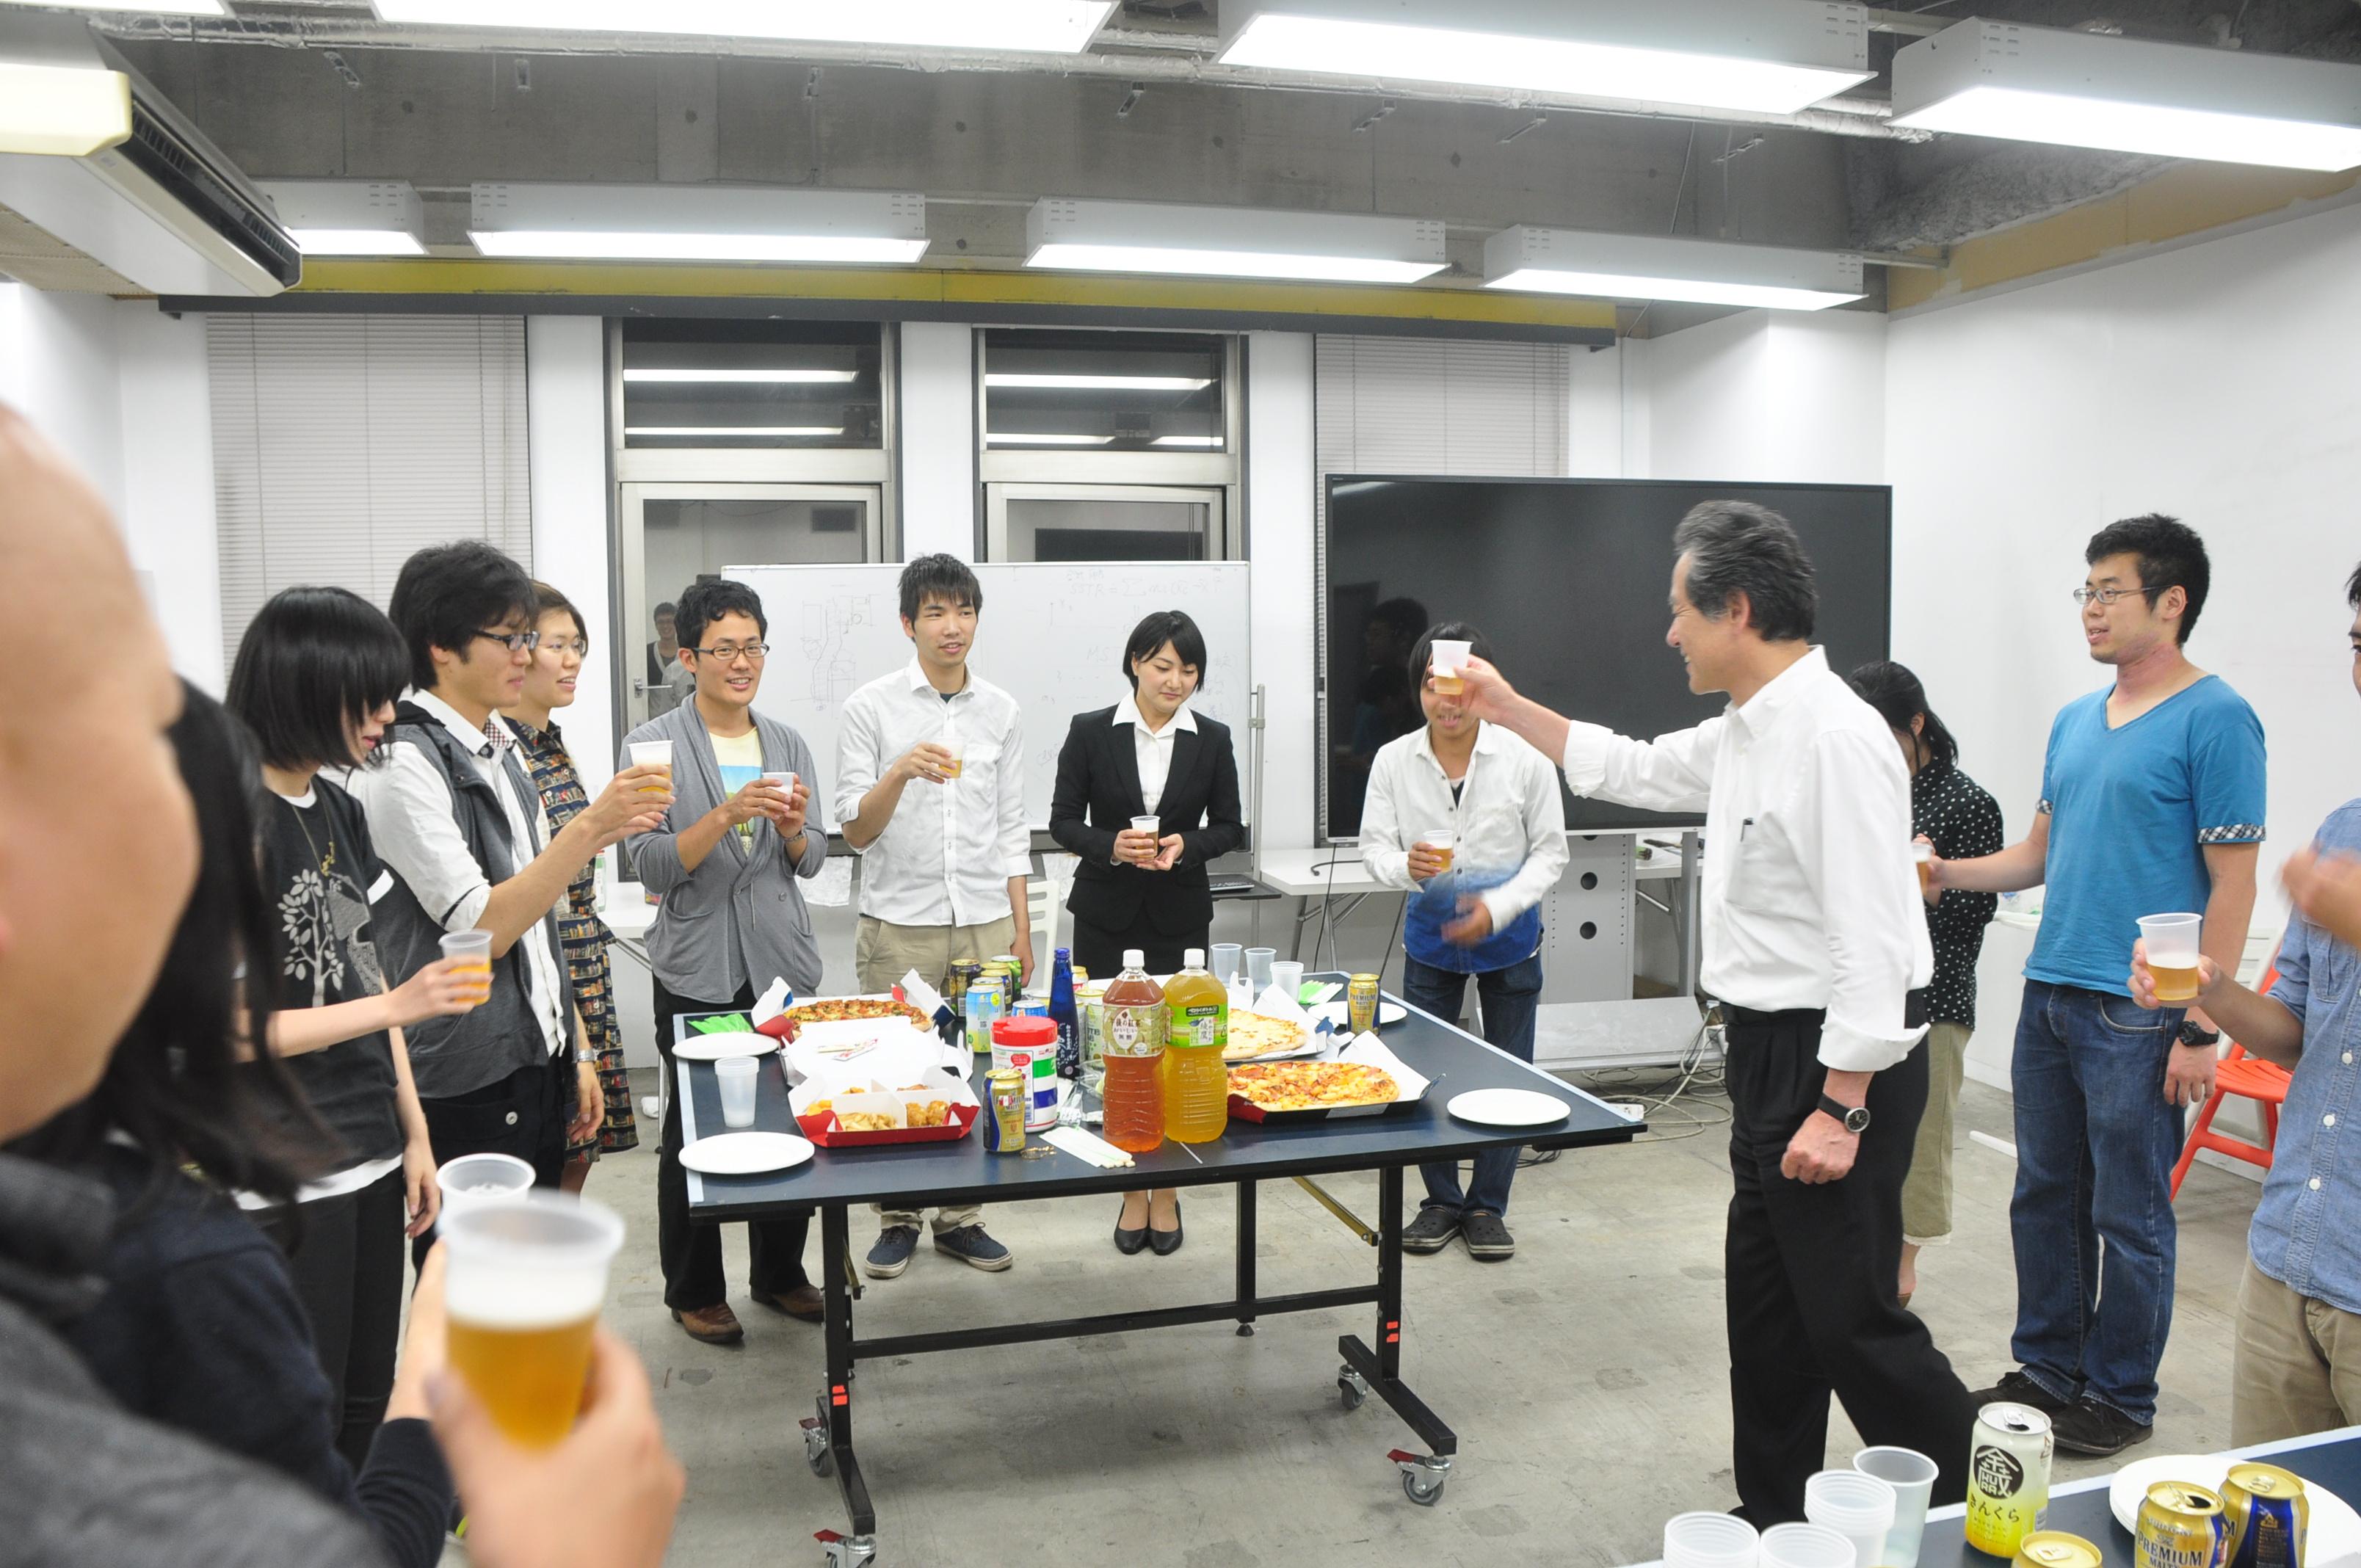 http://ud.t.u-tokyo.ac.jp/blog/2015/06/21/DSC_8455.JPG